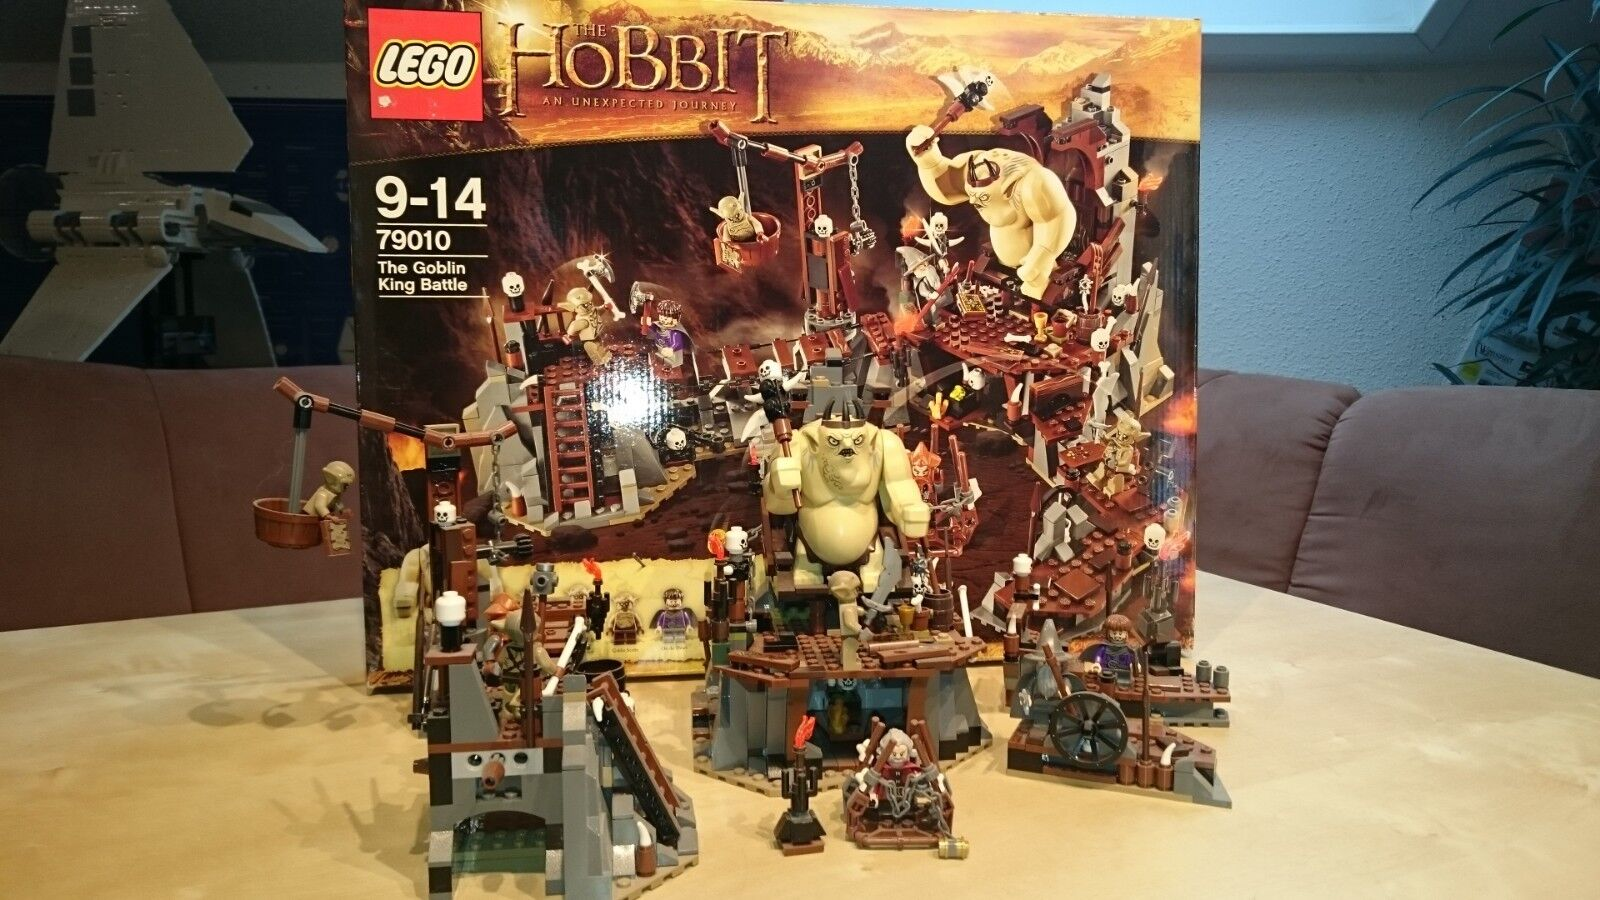 LEGO The Hobbit Höhle des Goblin Königs (79010)